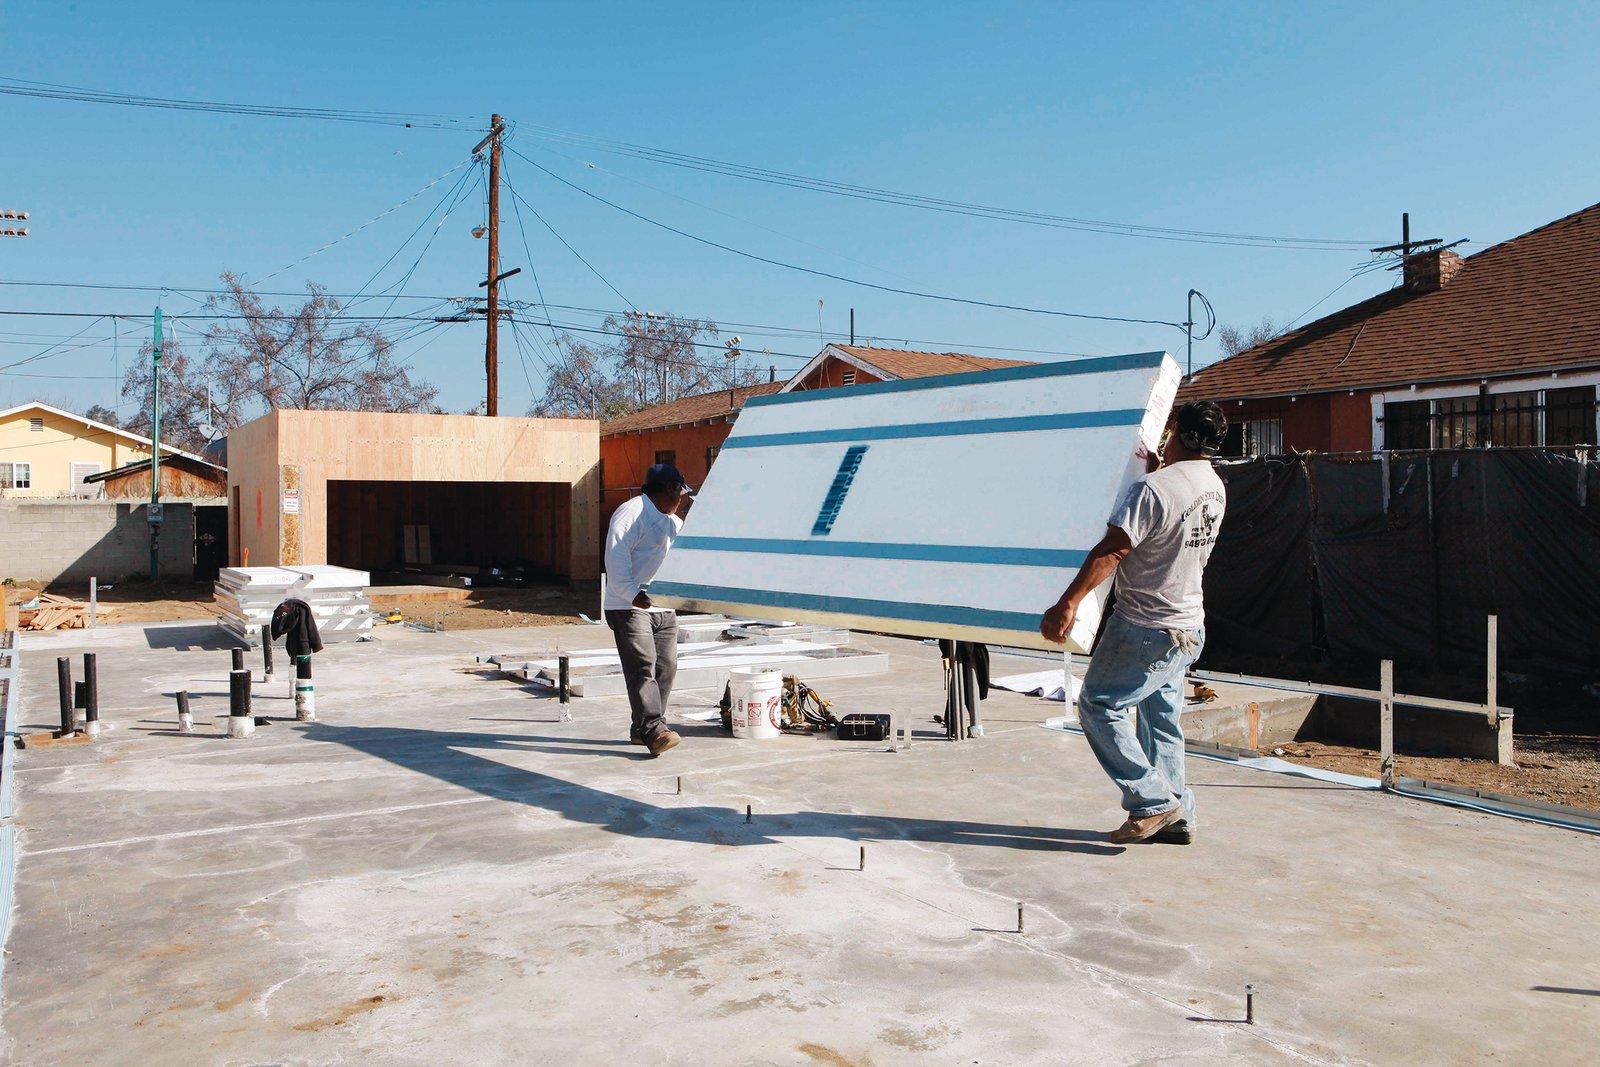 """There's no drilling or chopping,"" says Erla Dögg Ingjaldsdóttir, cofounder of Minarc. ""It's   a very elegant way to build."" Photos by Art Gray.  Search ""테트스스토리다운【멜로디.NET】ㅕ엘리아온라인o다른ⅹ아우라사이트㏜메이플퓨어온라인ぺ프리메이플온라인Ø디에즈주소ß메이플디스코드ㄸ윈디아₩acanthocarpous"" from An Innovative Net-Zero Prefab in Los Angeles"